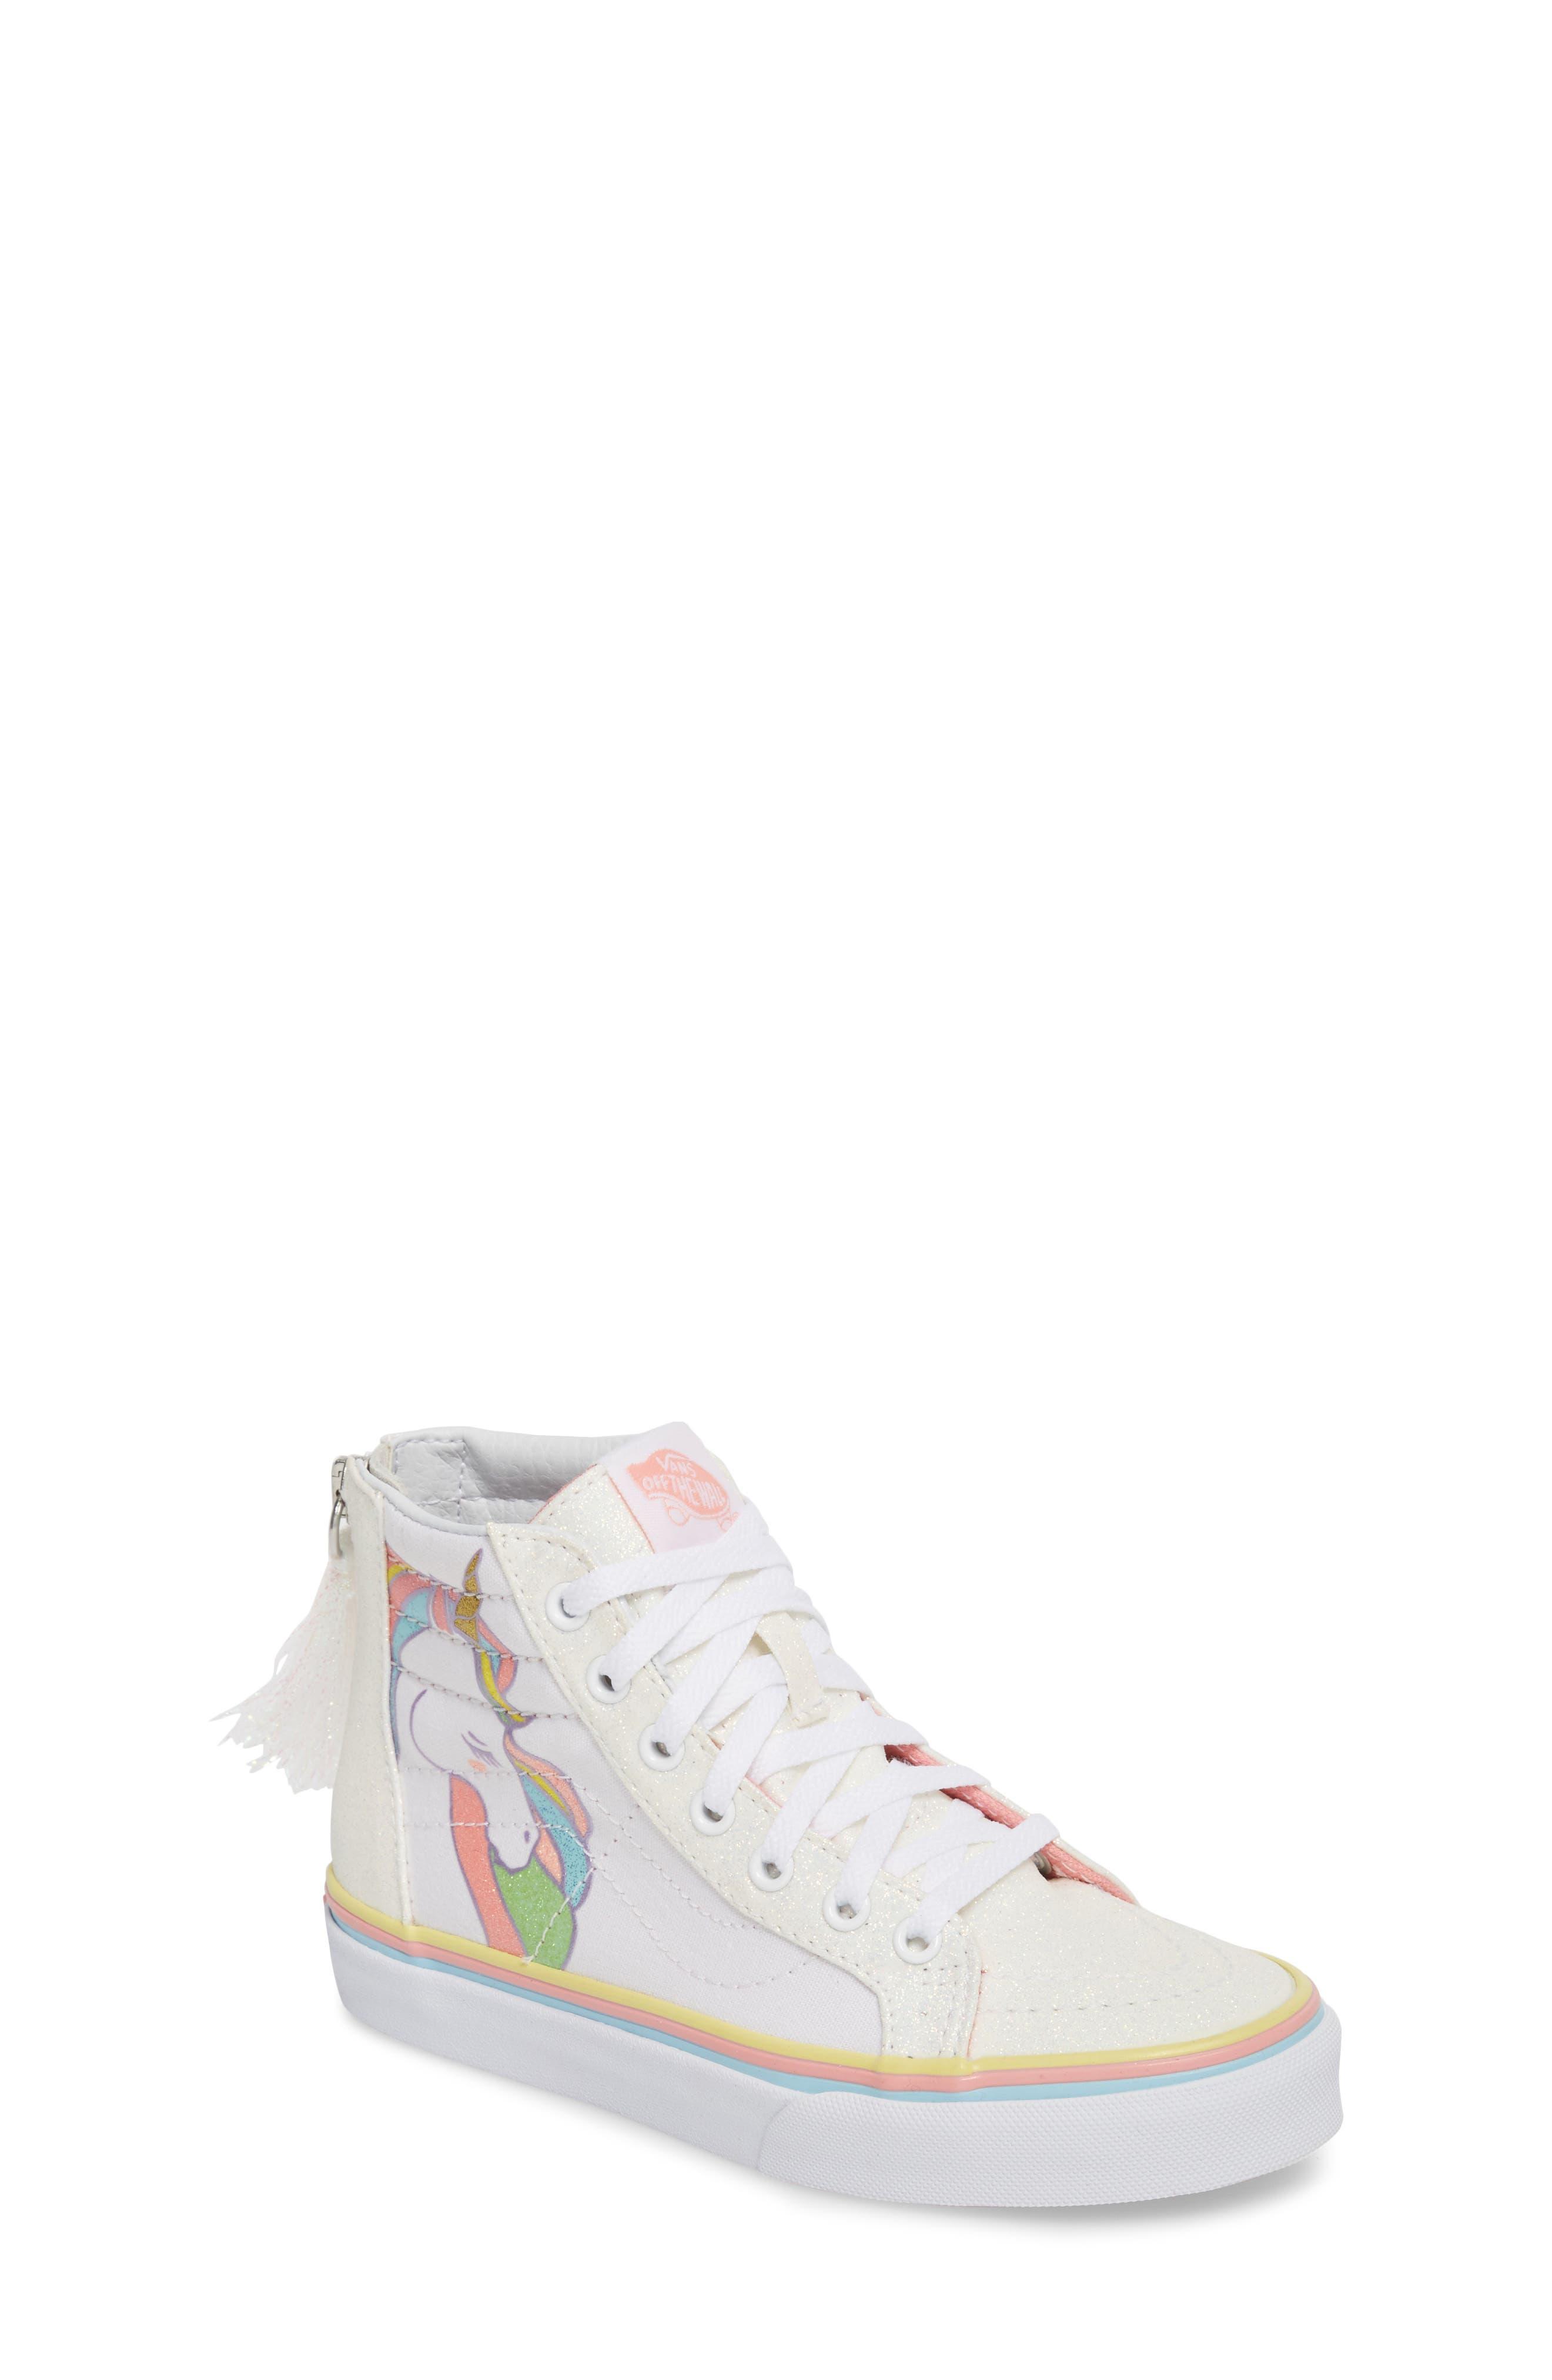 Sk8-Hi Zip Unicorn Glitter High Top Sneaker,                         Main,                         color, White Glitter Unicorn